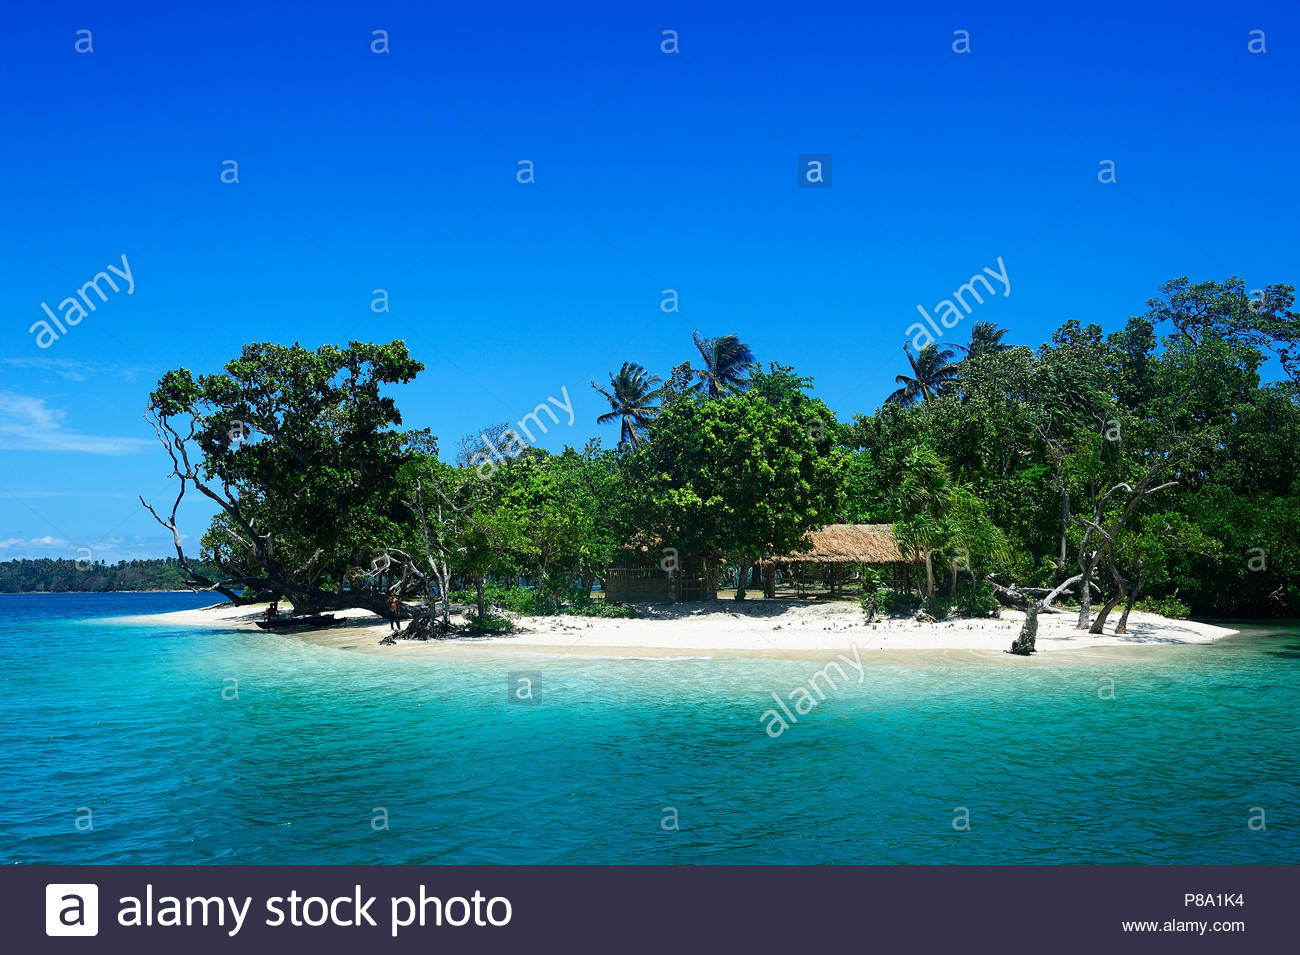 Duke of York Island, Rabaul, East New Britain, Papua New Guinea.